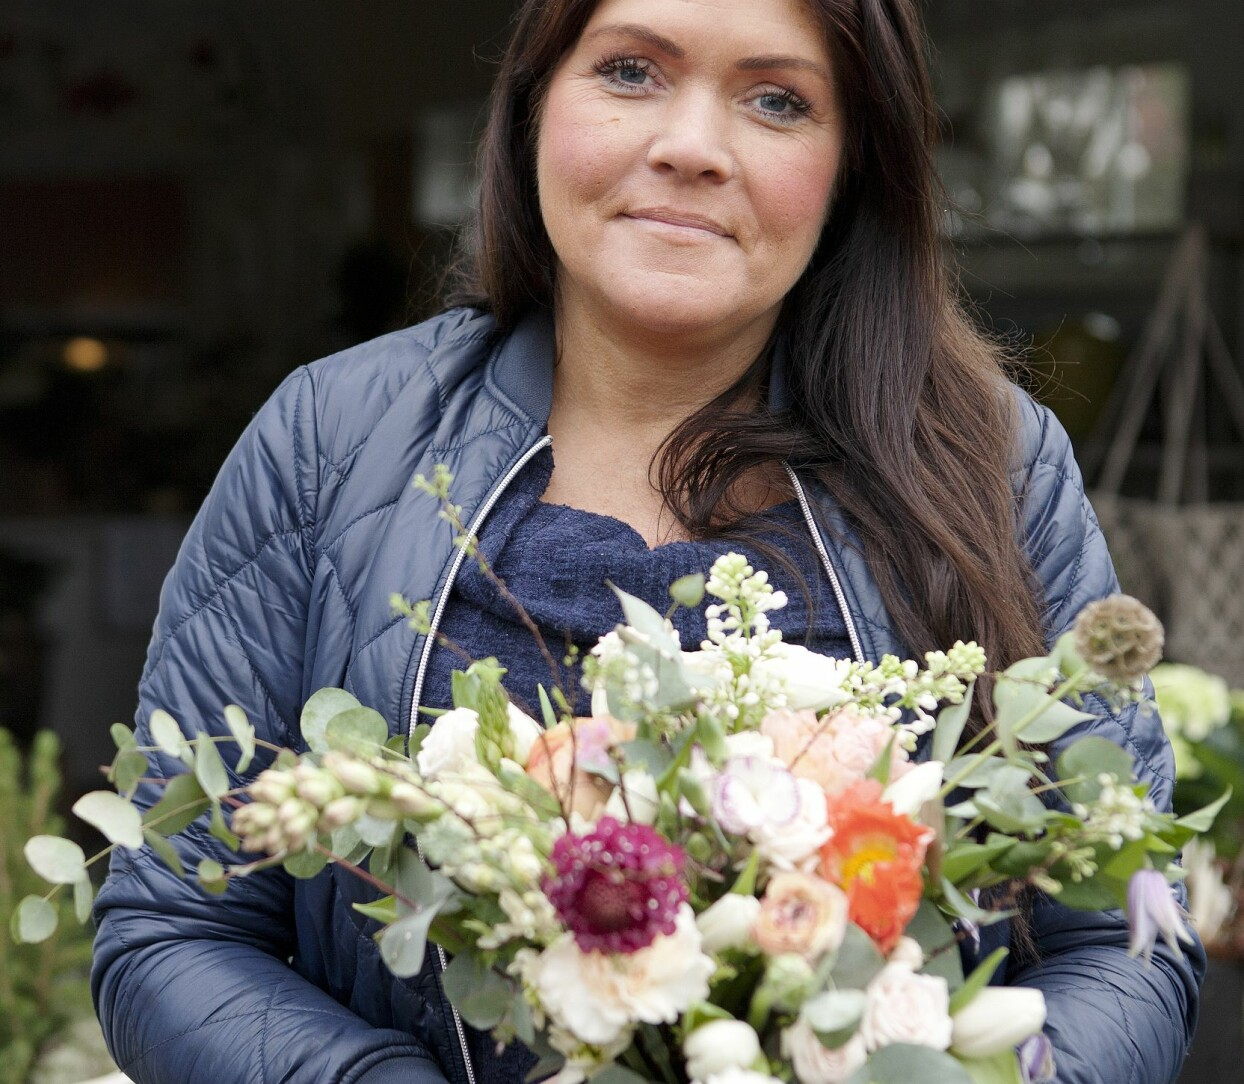 Tottie Larsson med vår fina vårbukett.